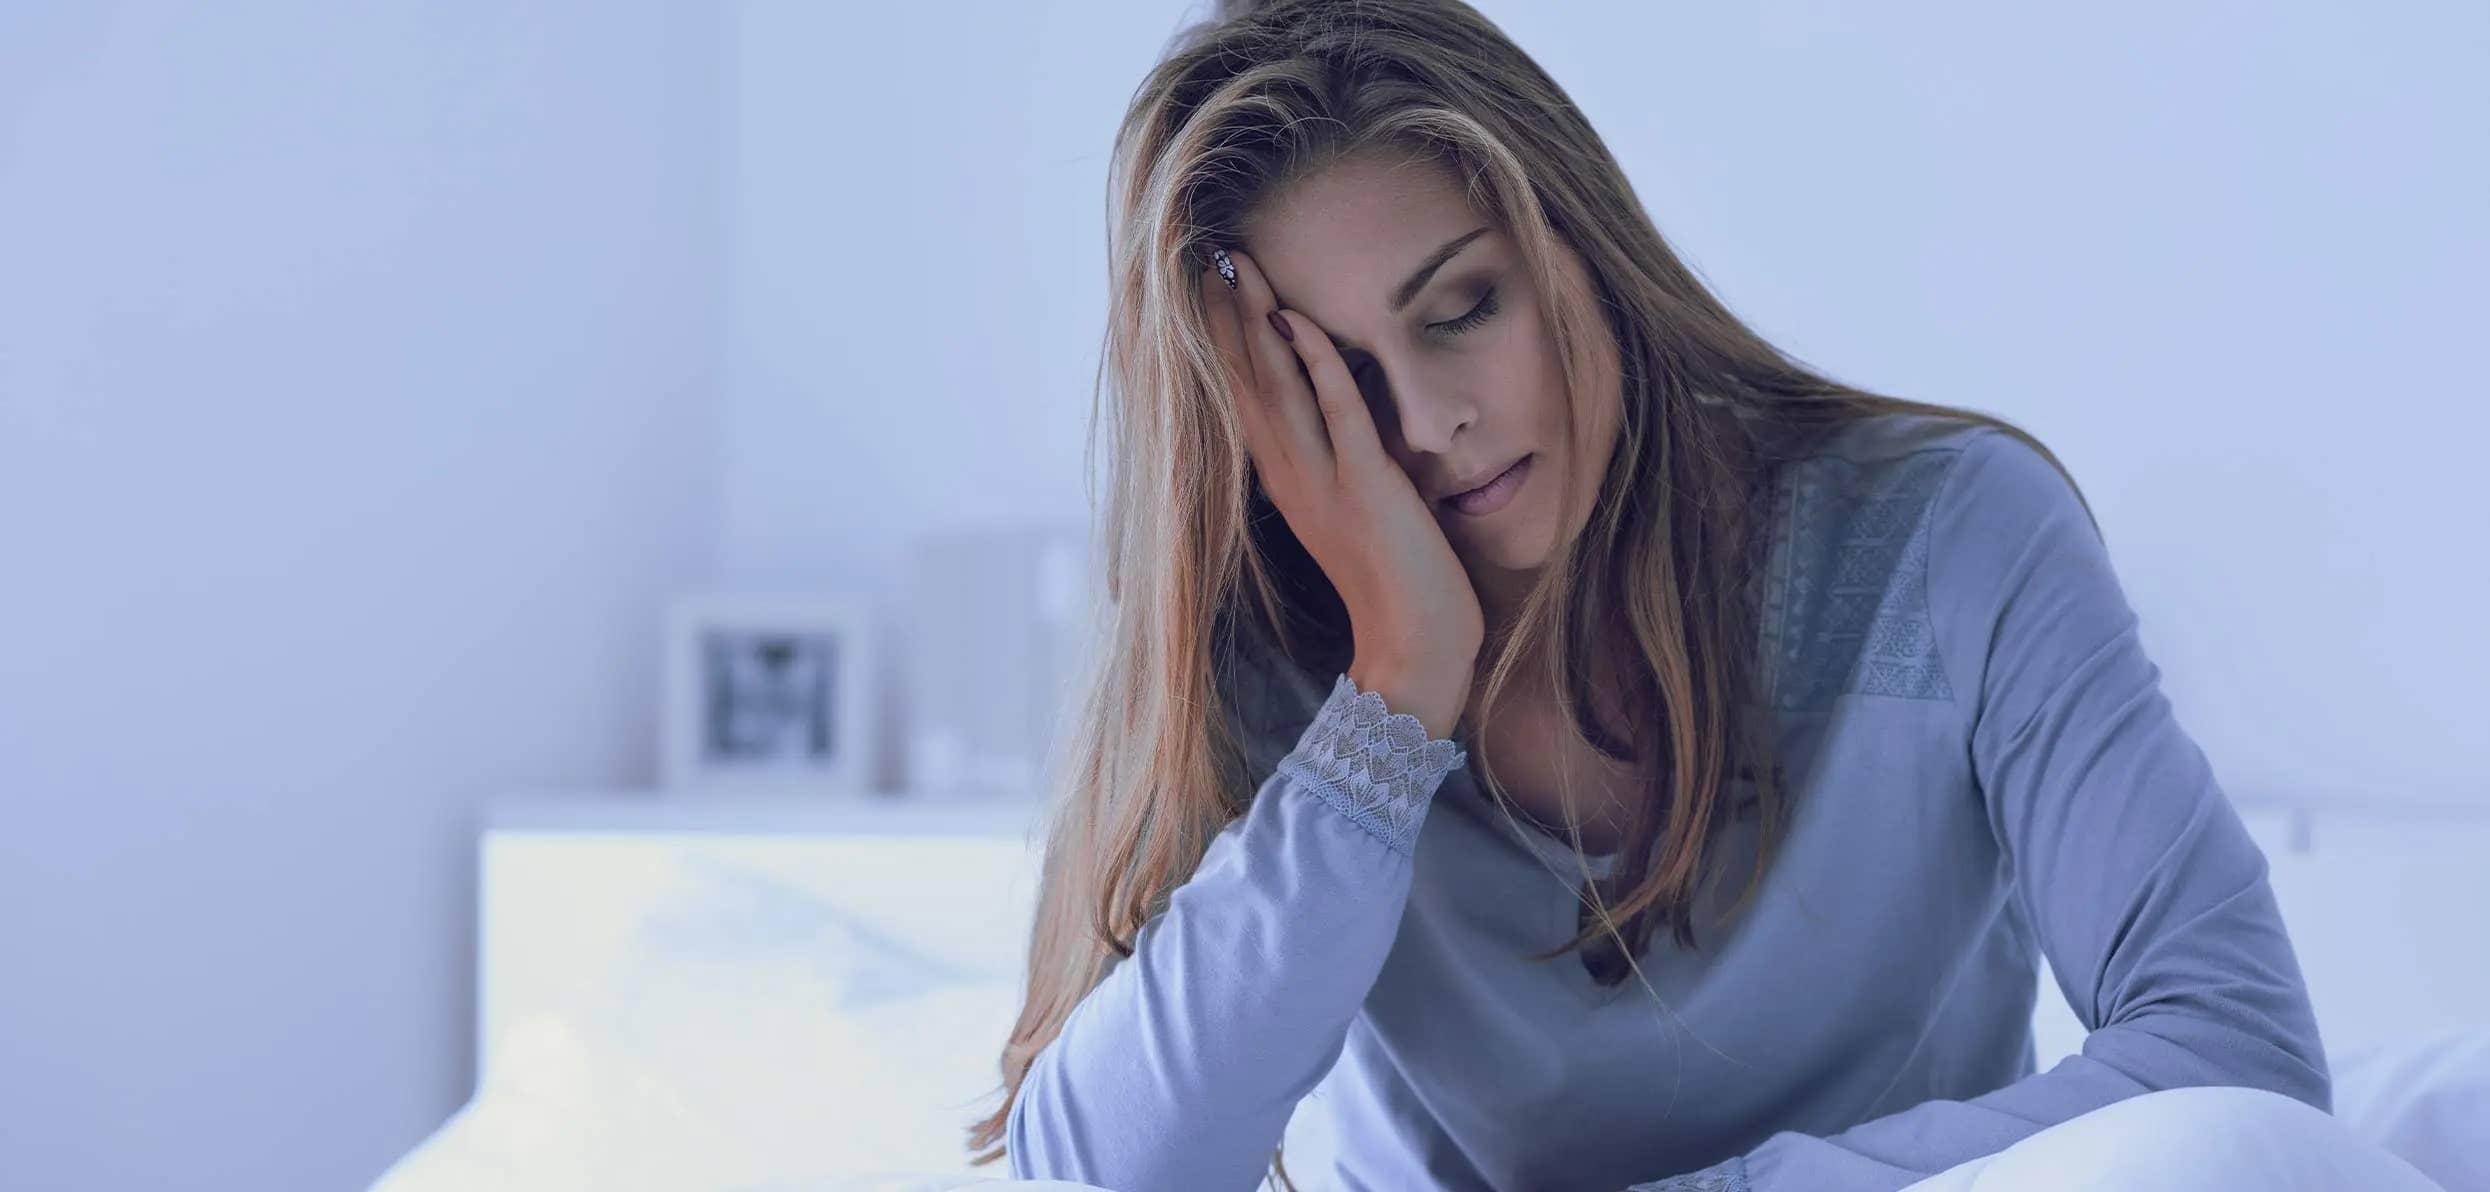 Sleepy woman facepalming - estrogen and sleep disturbances